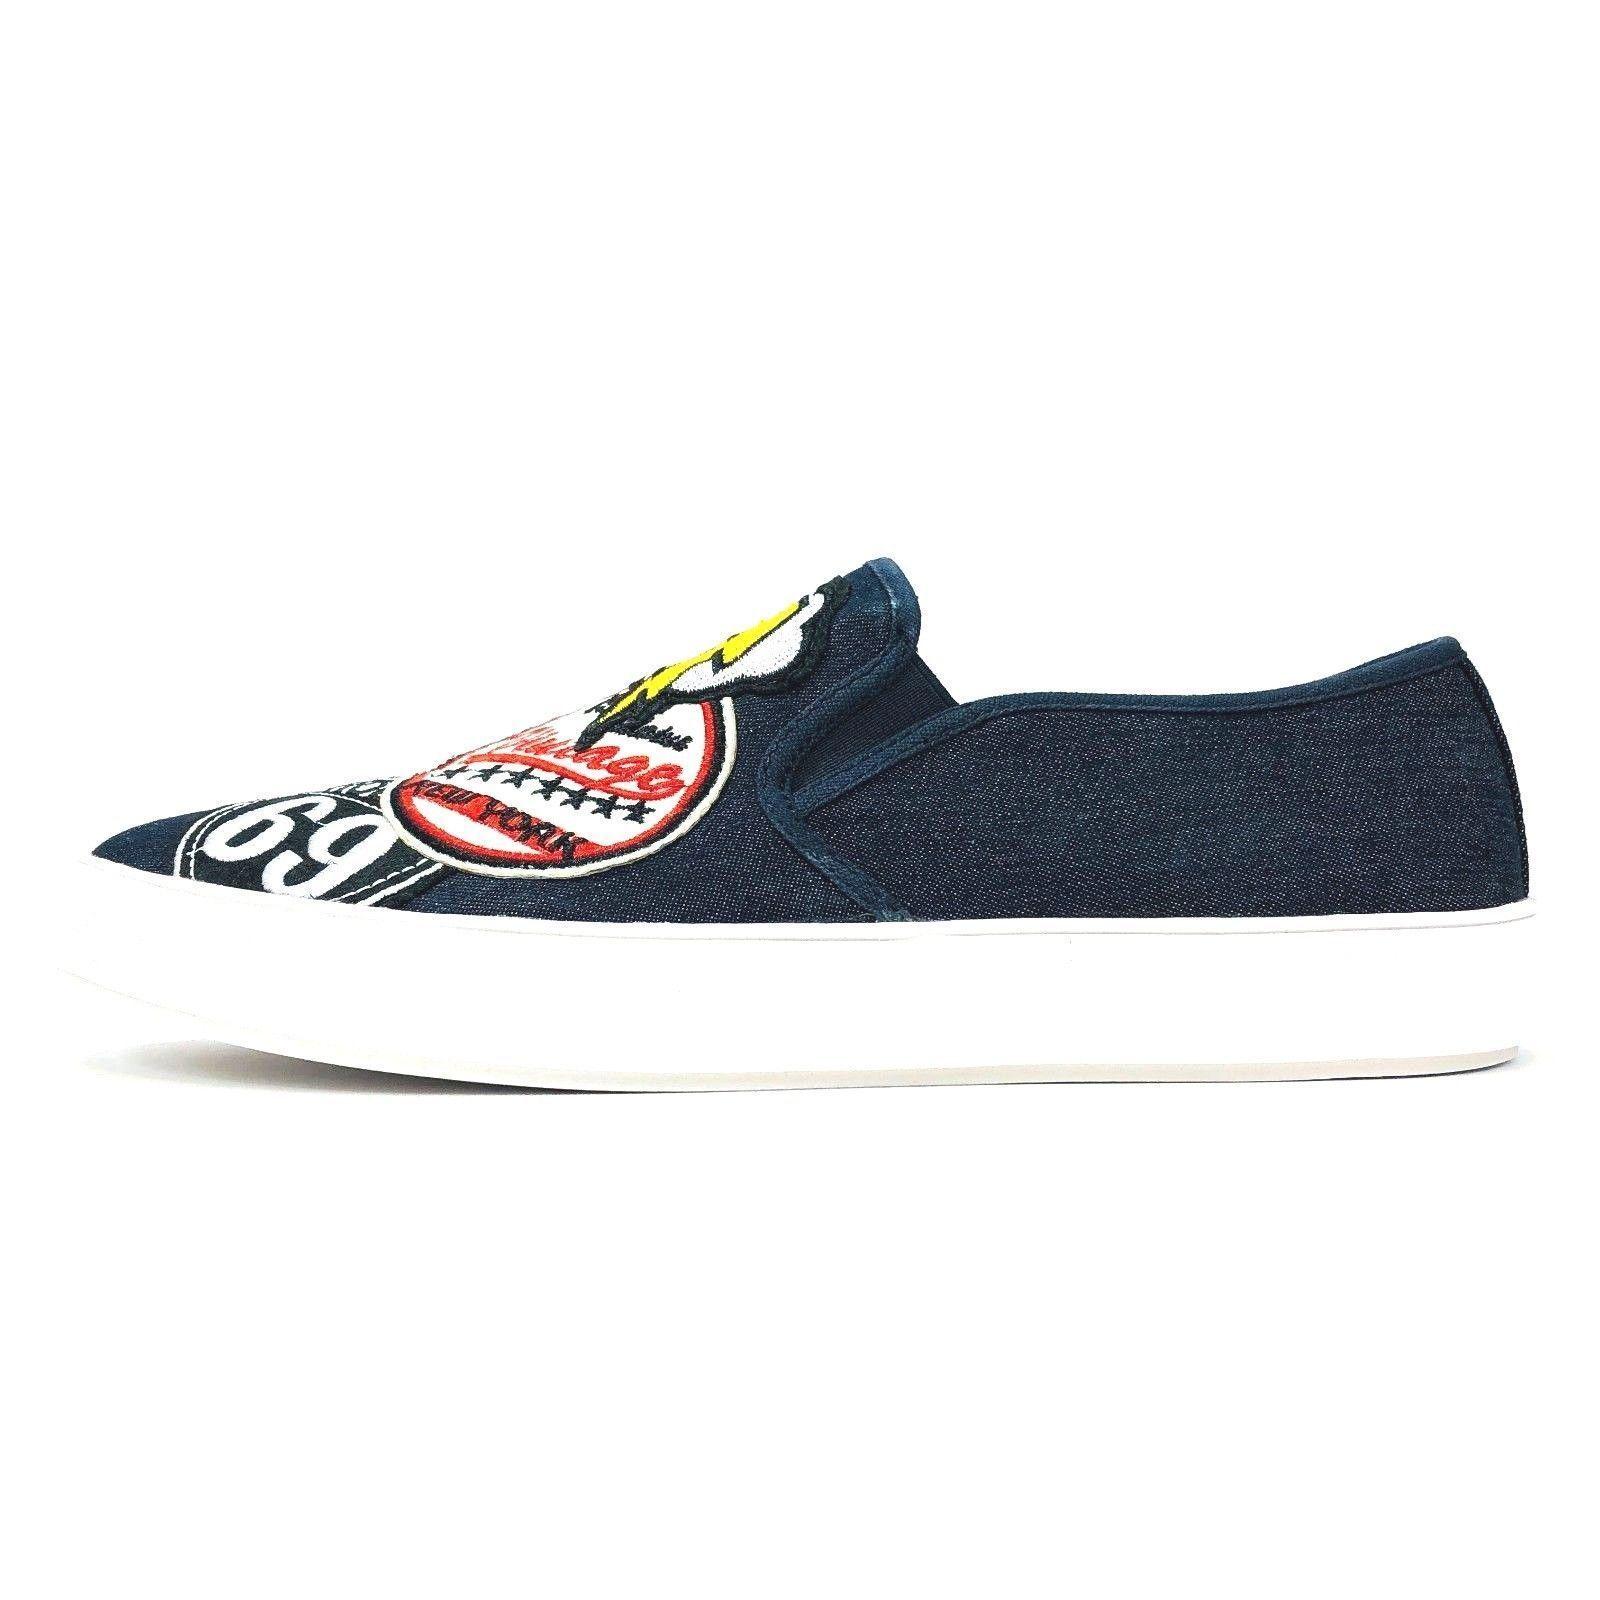 Steve Madden Wasdin Navy Blue or Military Denim Slip On Loafers Mens Vintage image 15